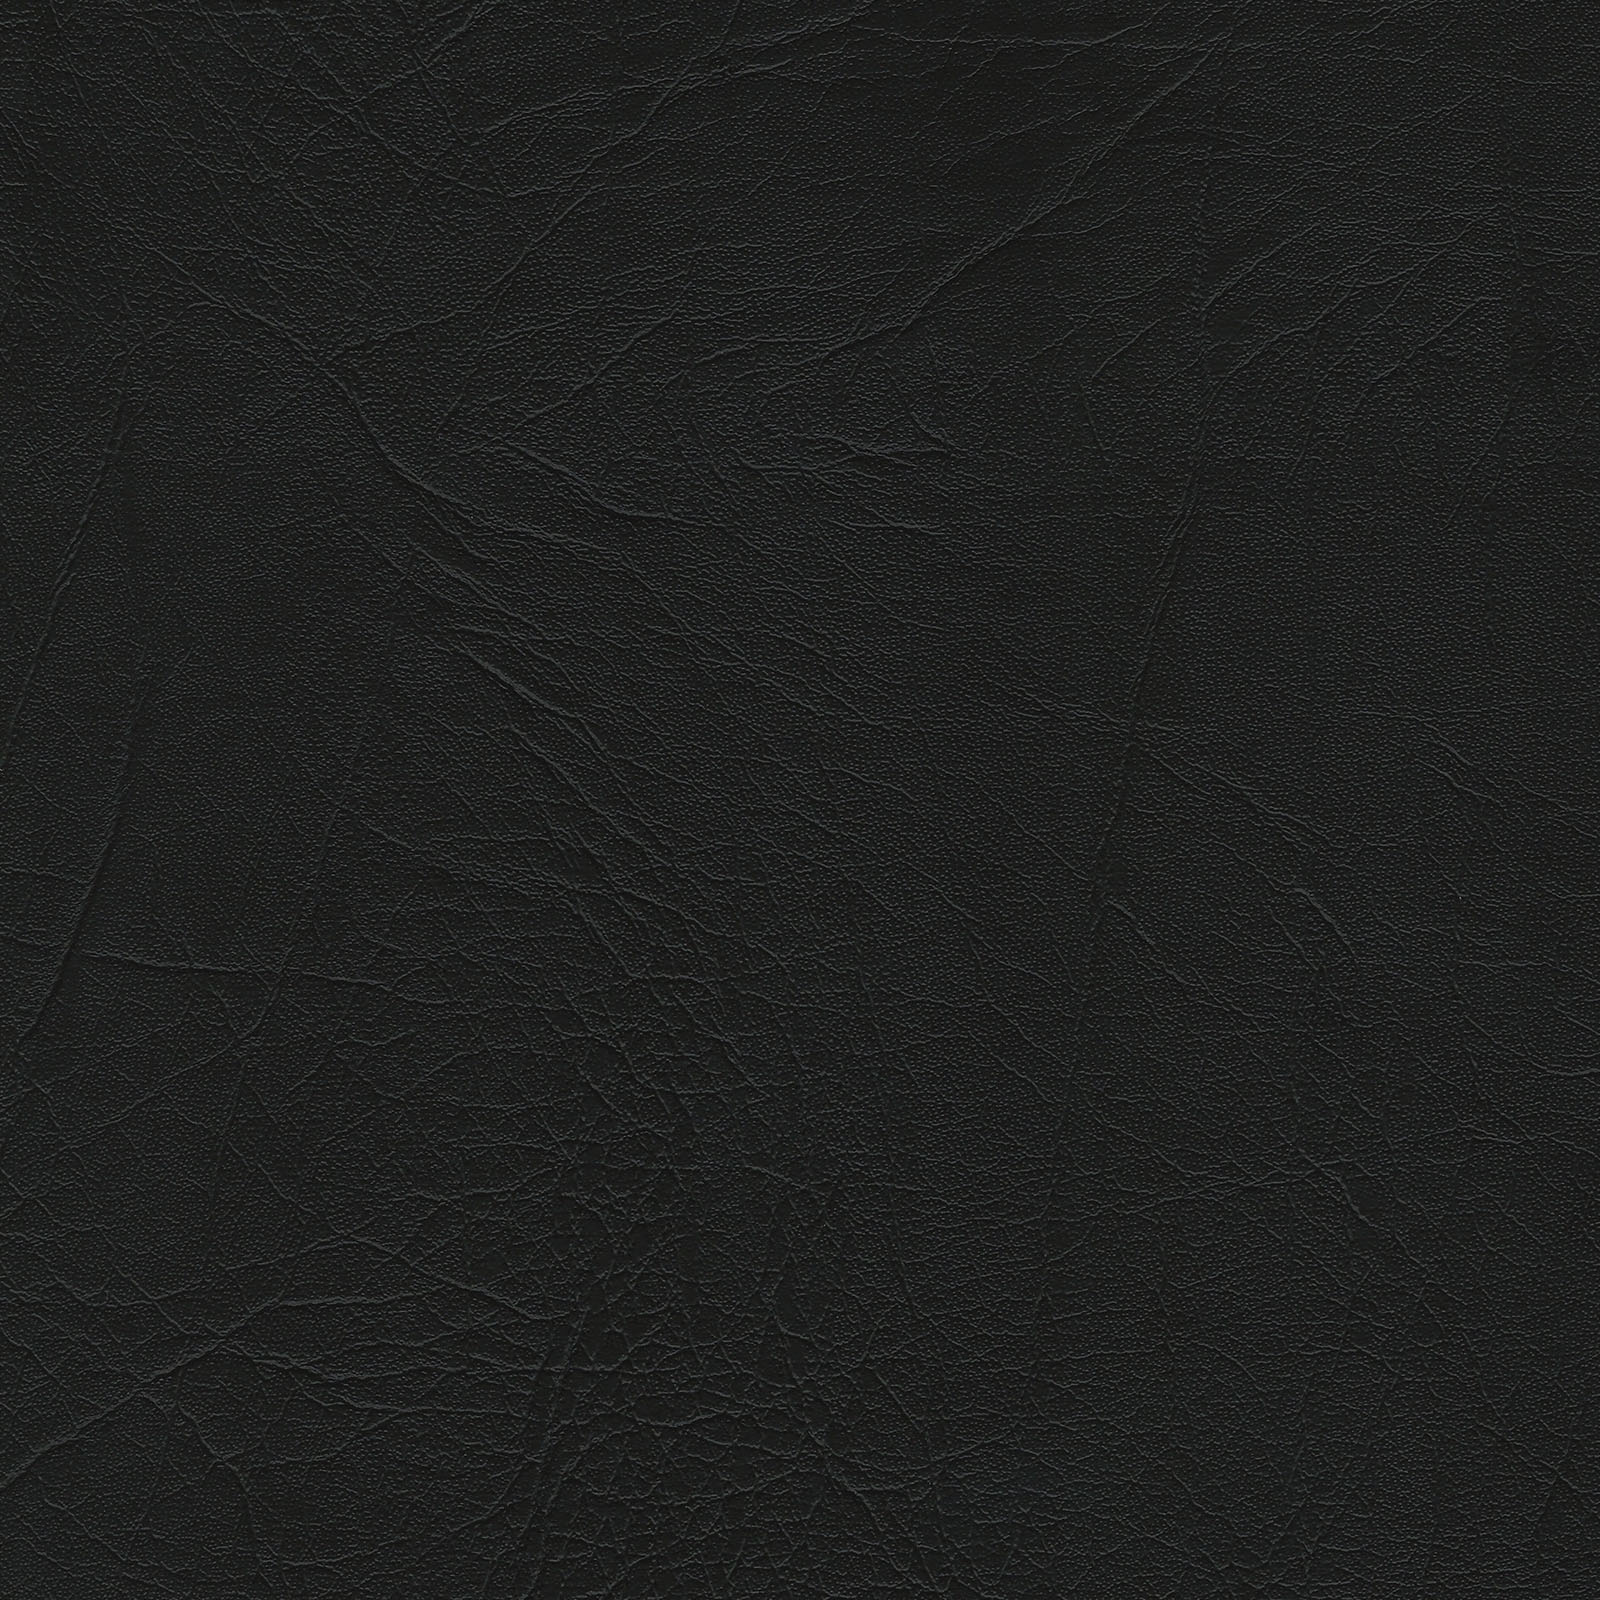 EZ Vinyl - EZY-5832 - Oxen Black